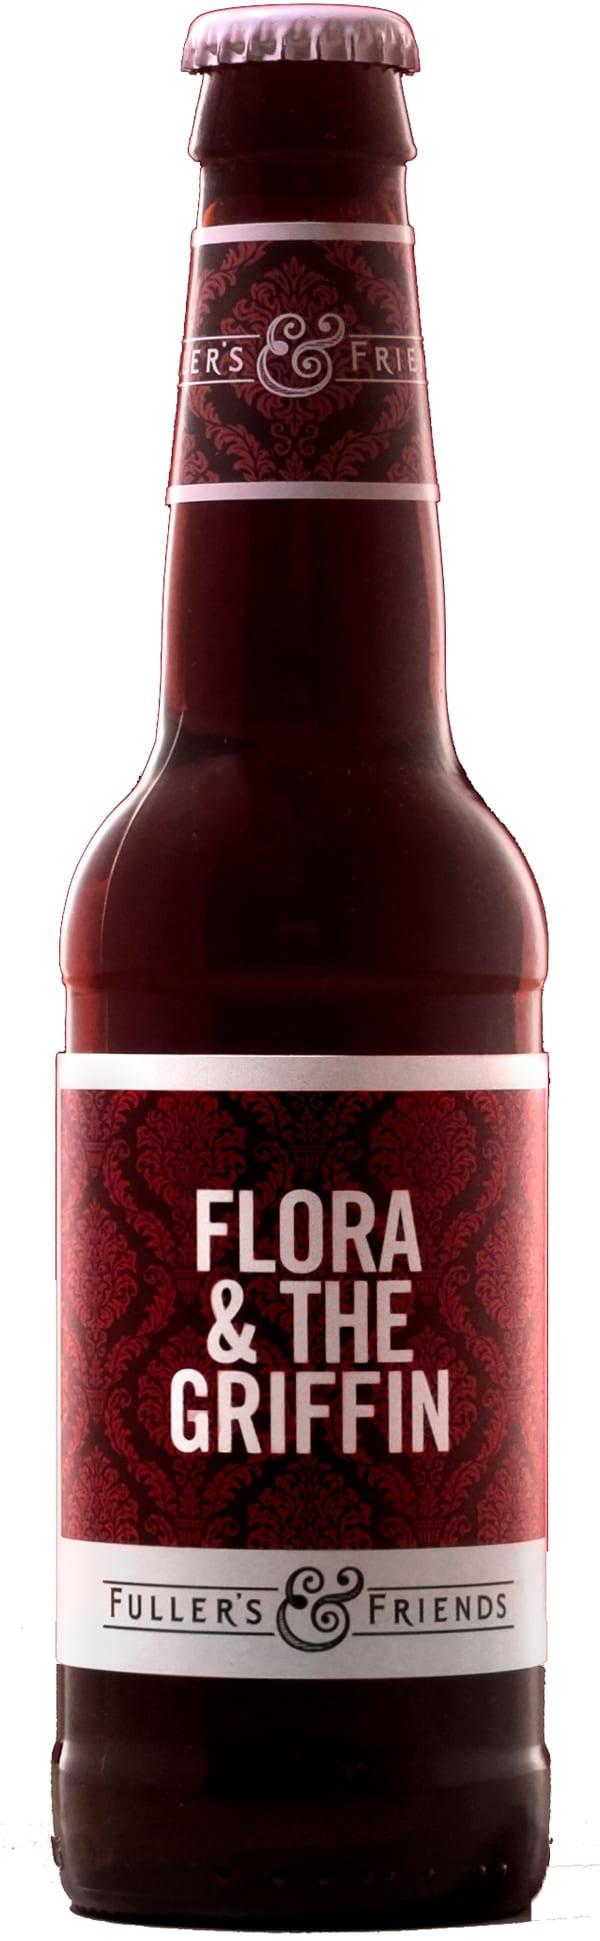 Fuller's & Friends Flora & the Griffin